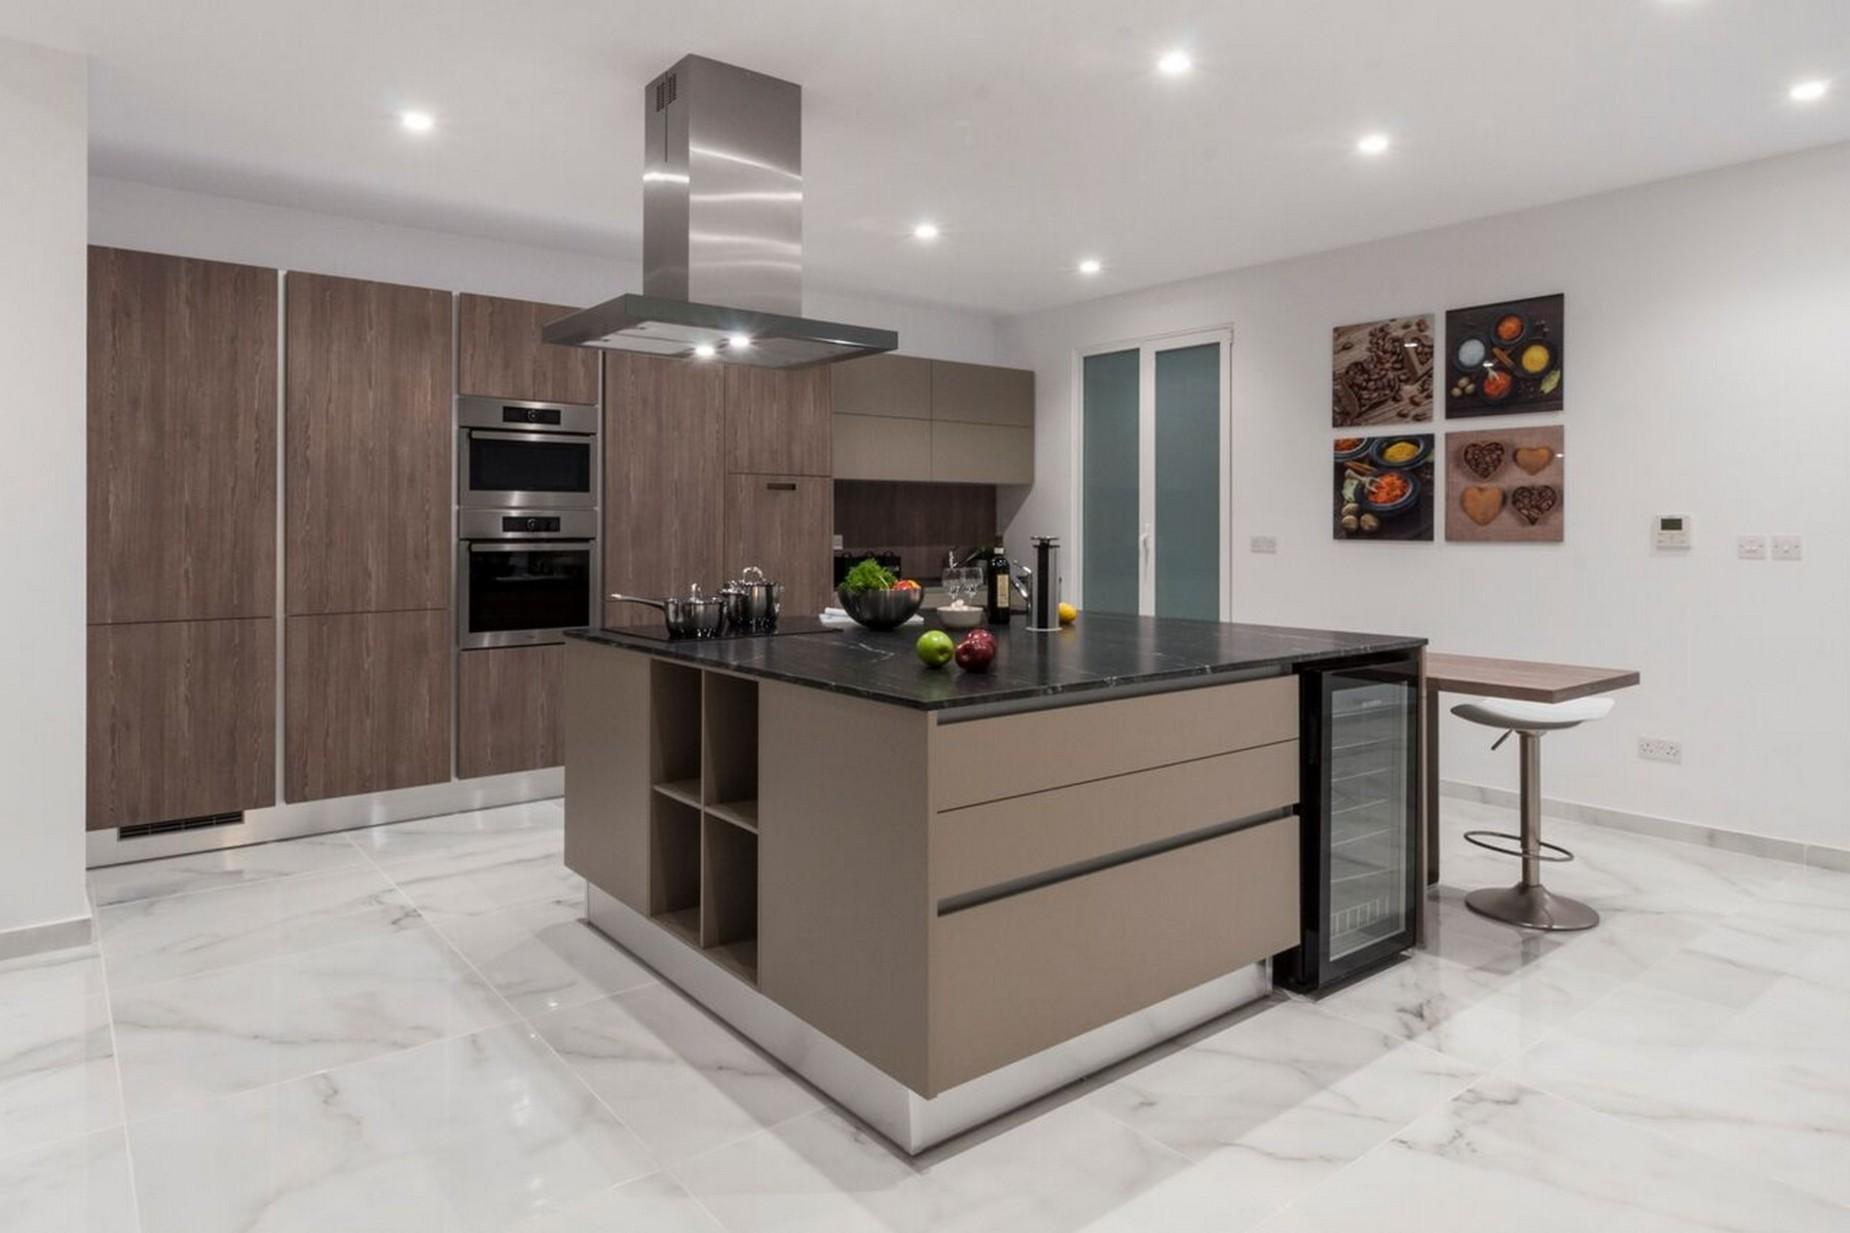 0 bed Apartment For Rent in Sliema, Sliema - thumb 4